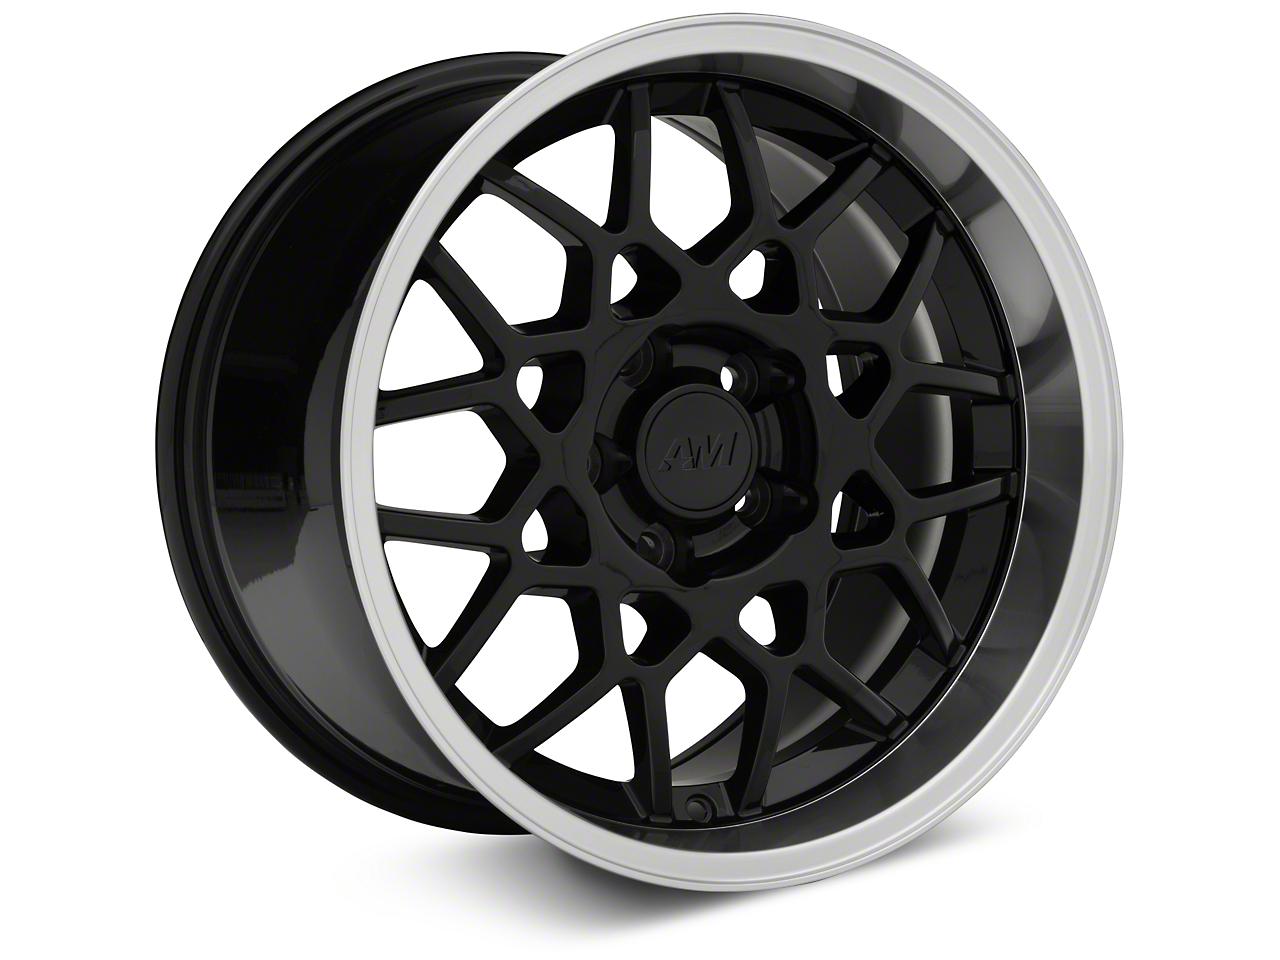 2013 GT500 Style Deep Dish Black Wheel - 17x10.5 (94-04 All)